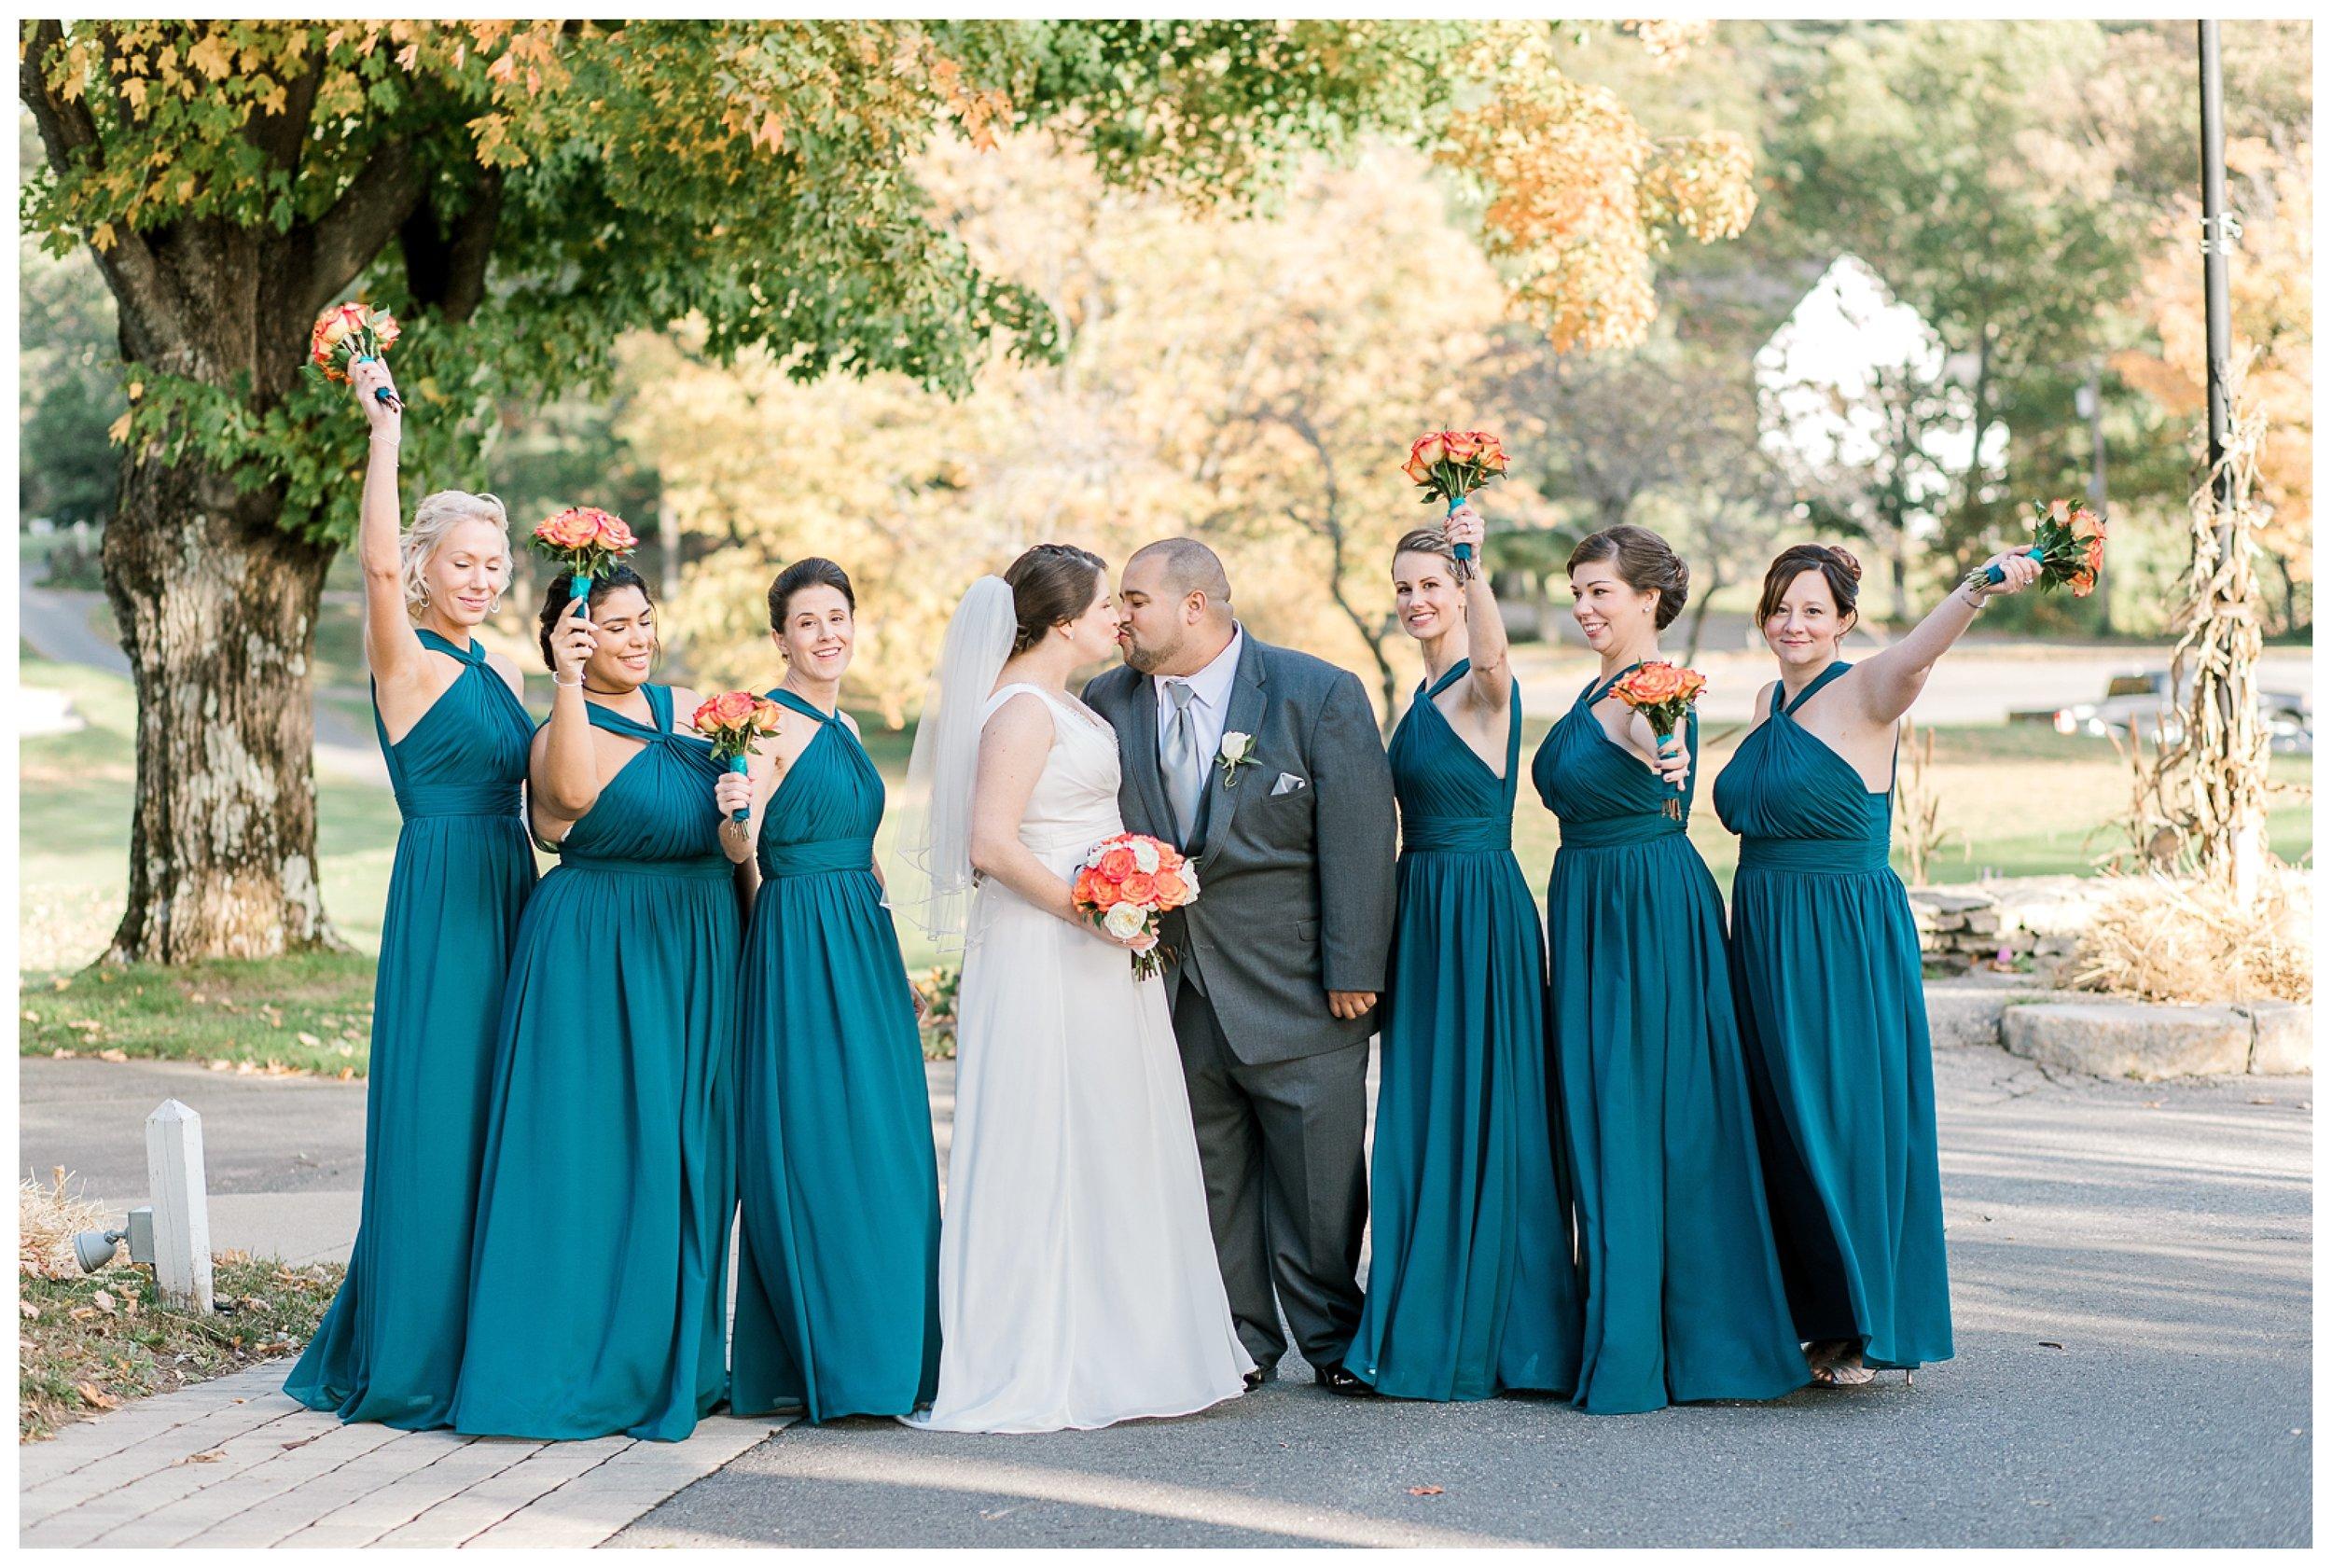 pleasant_valley_country_club_wedding_sutton_erica_pezente_photography (31).jpg